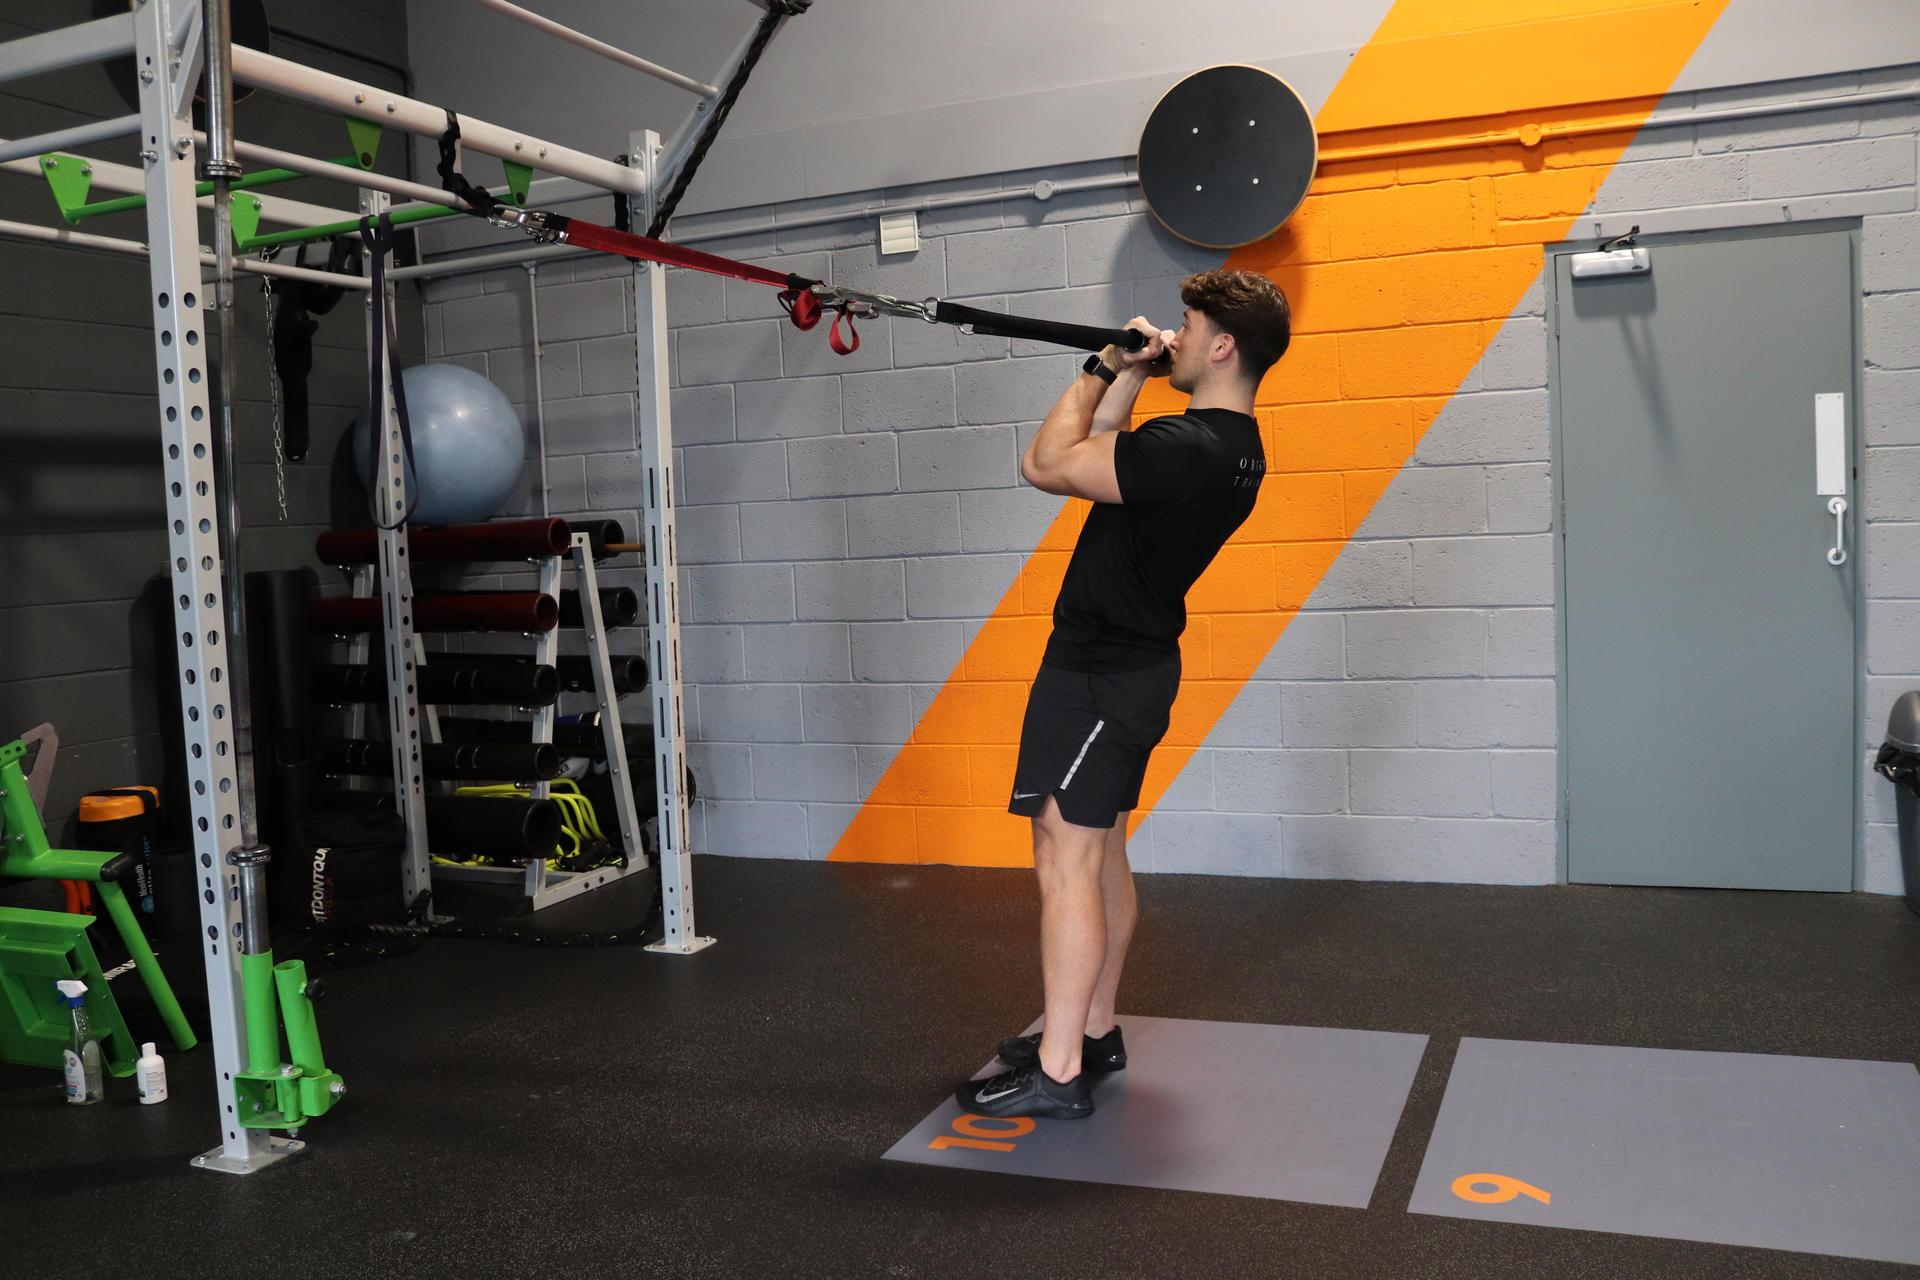 beginners trx exercises image